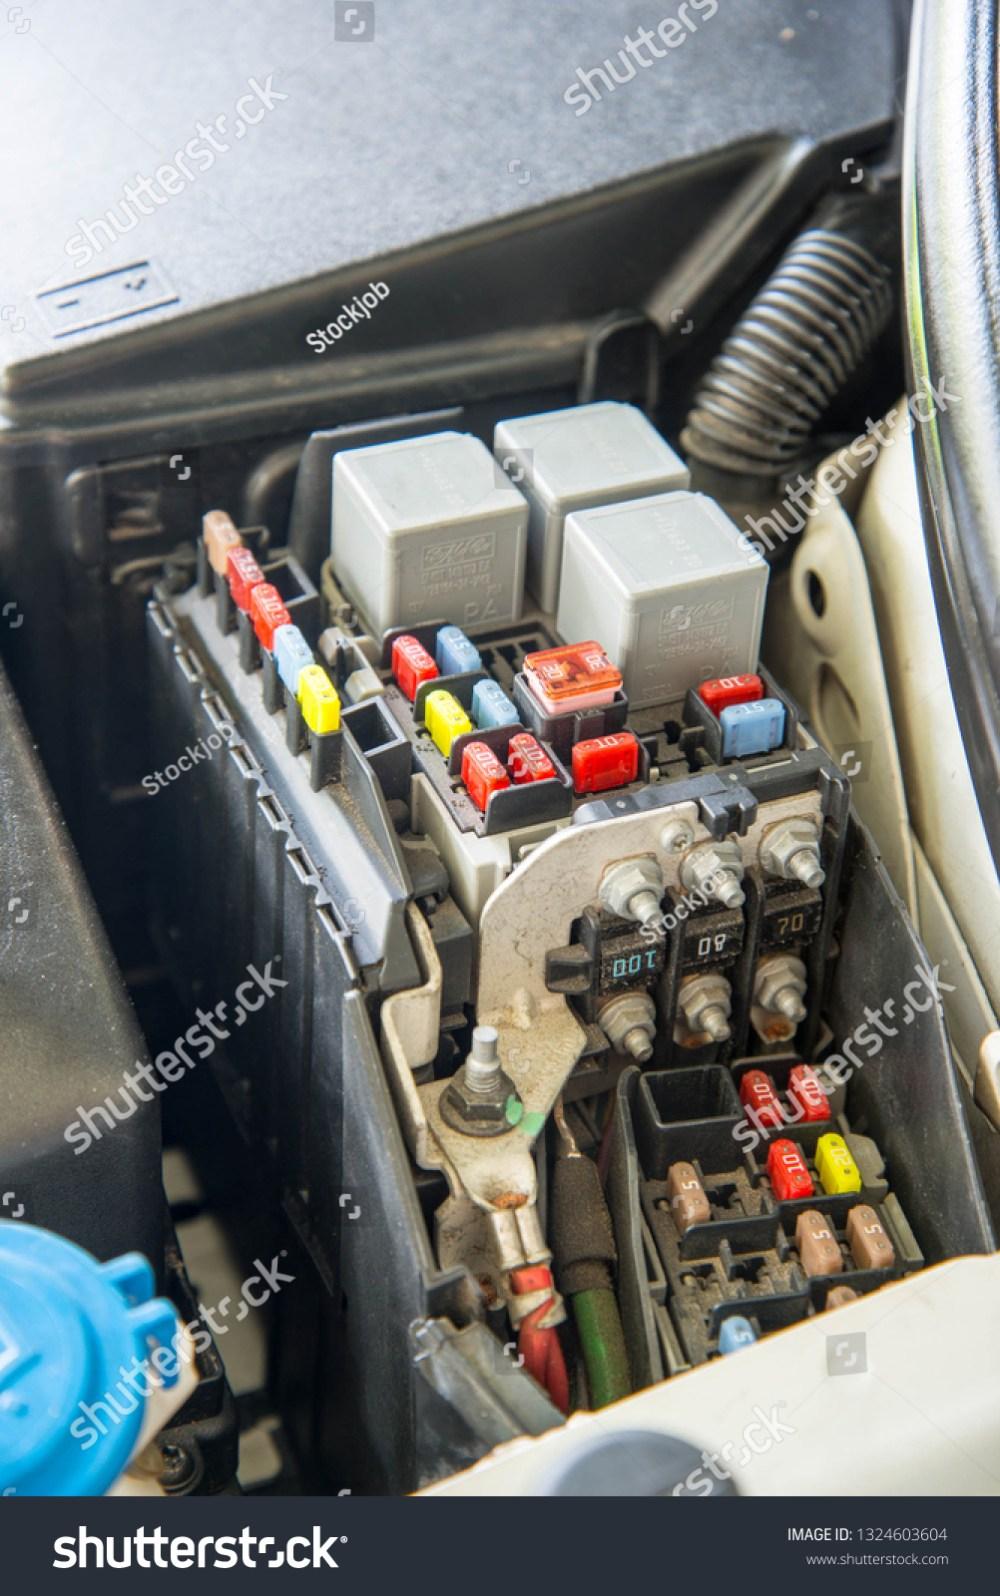 medium resolution of closed up car fuse box mini fuses and relays